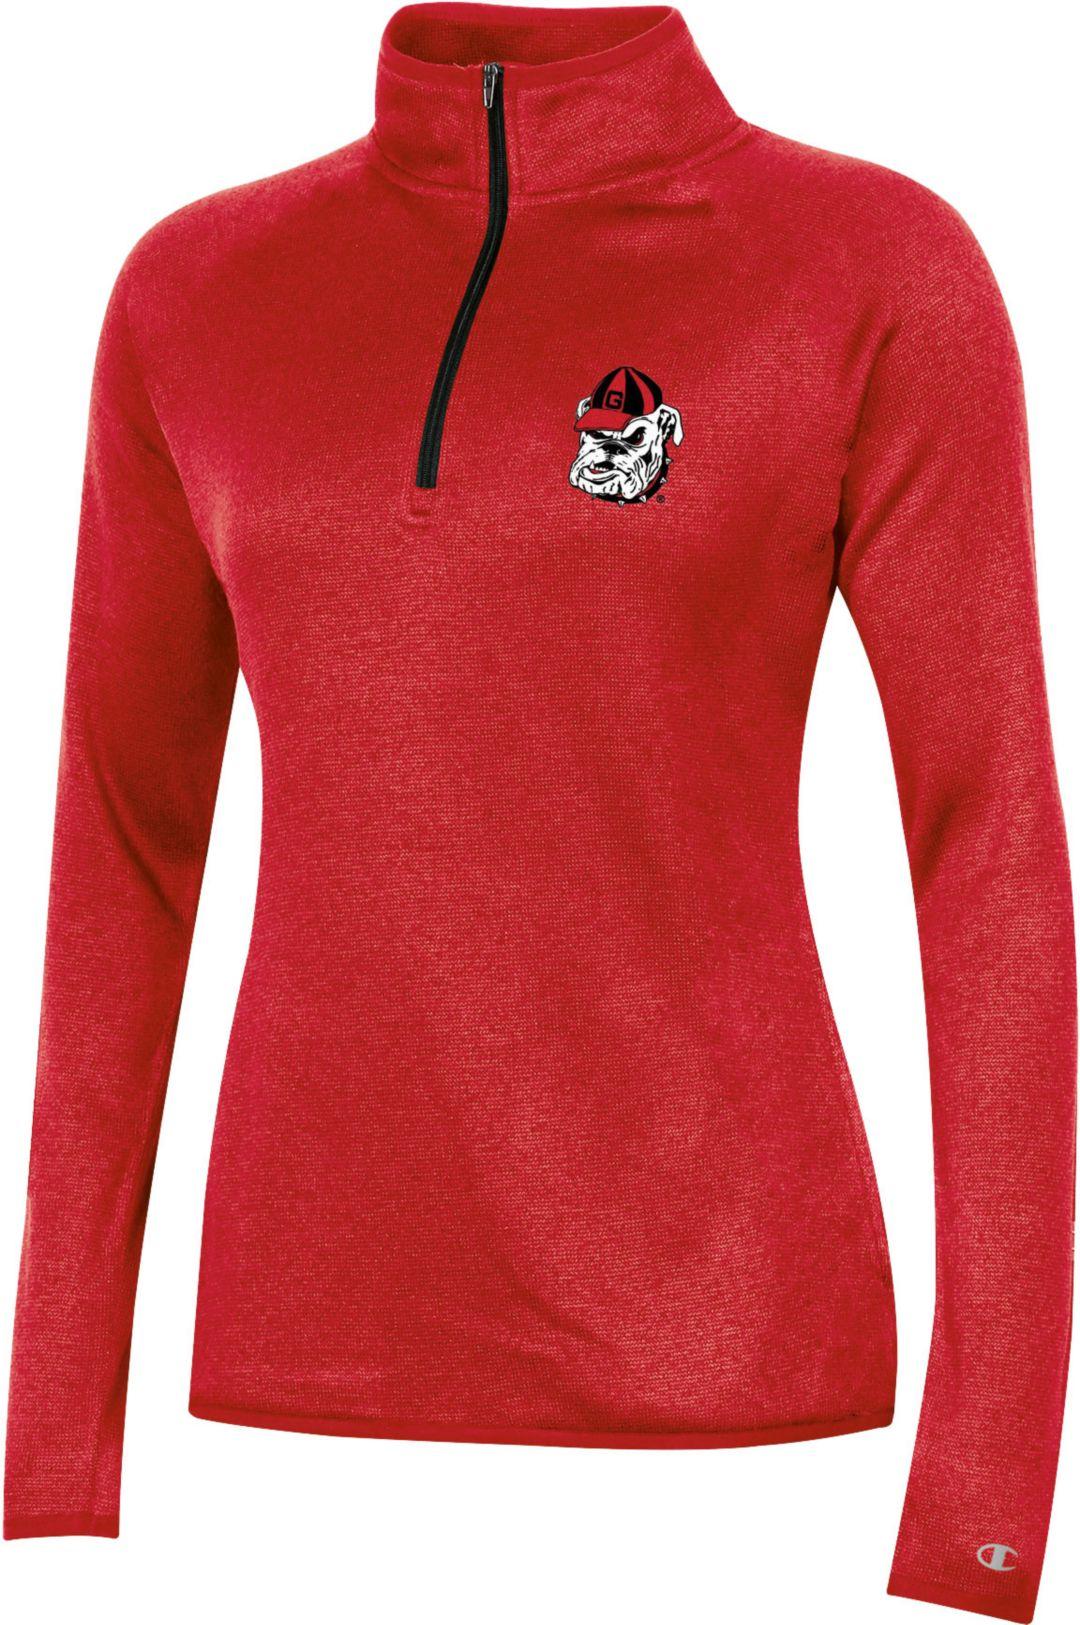 b870a42c Champion Women's Georgia Bulldogs Quarter-Zip Performance Red Shirt ...